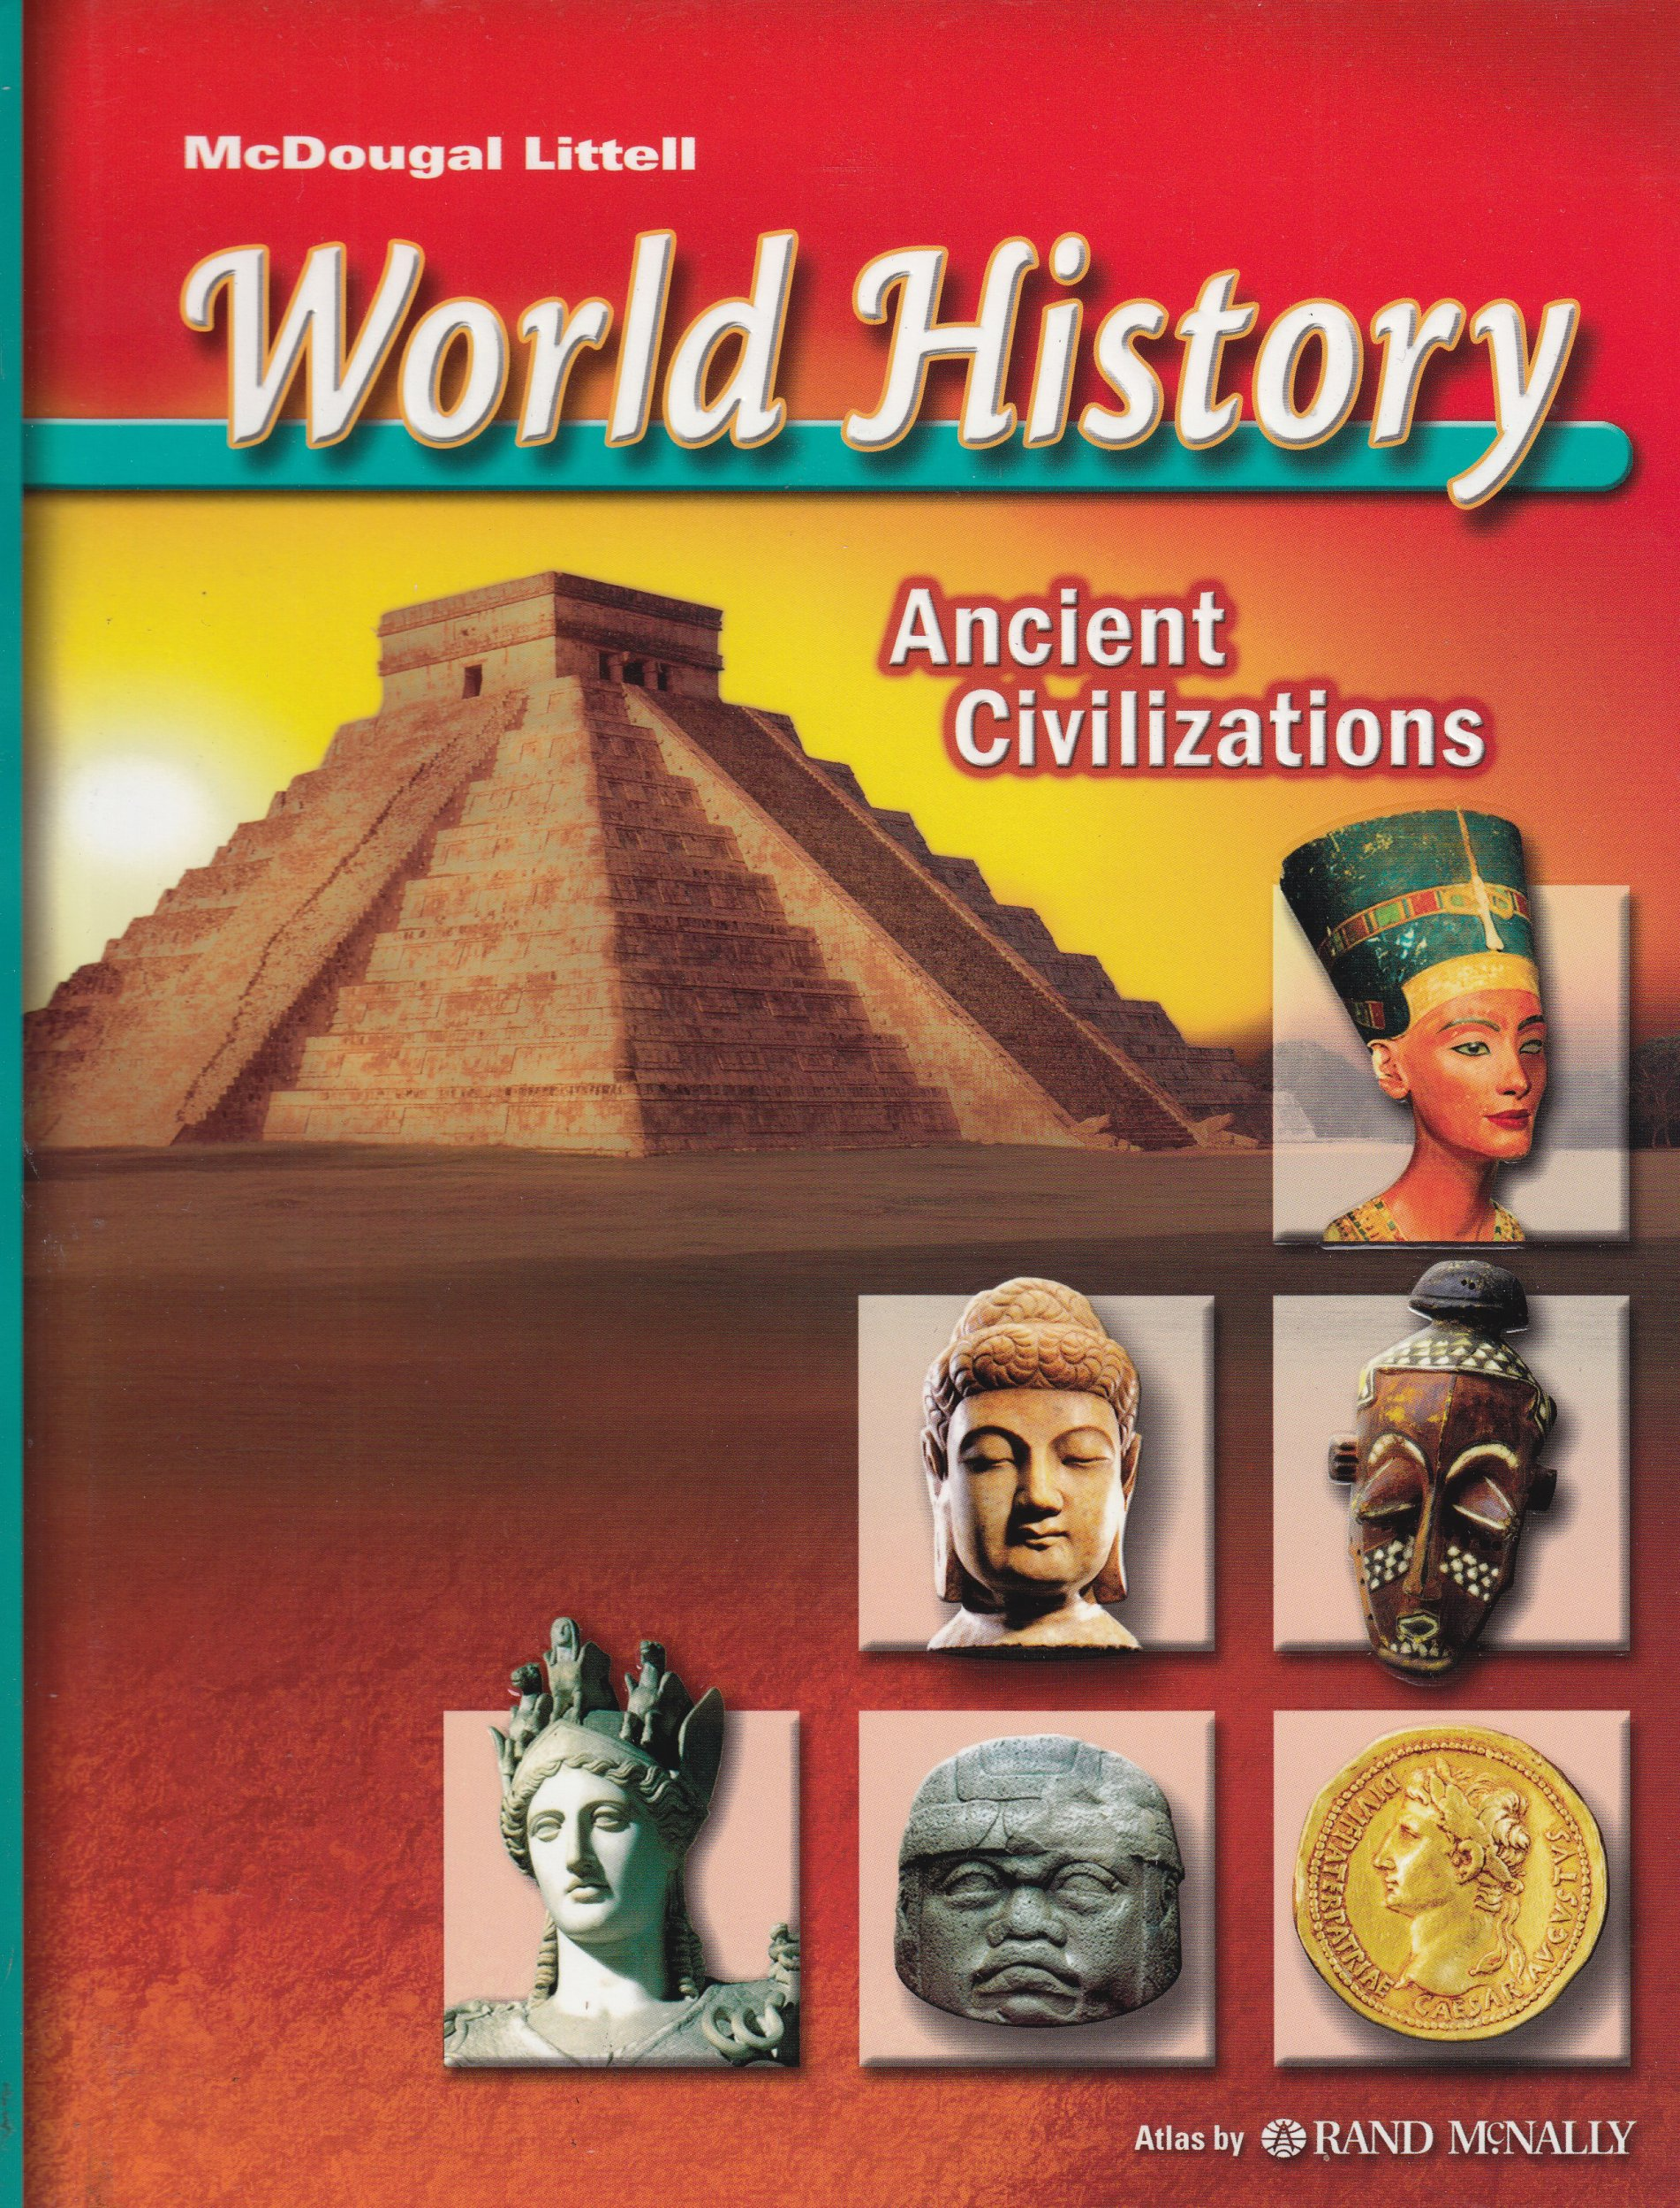 World History: Ancient Civilizations: MCDOUGAL LITTEL